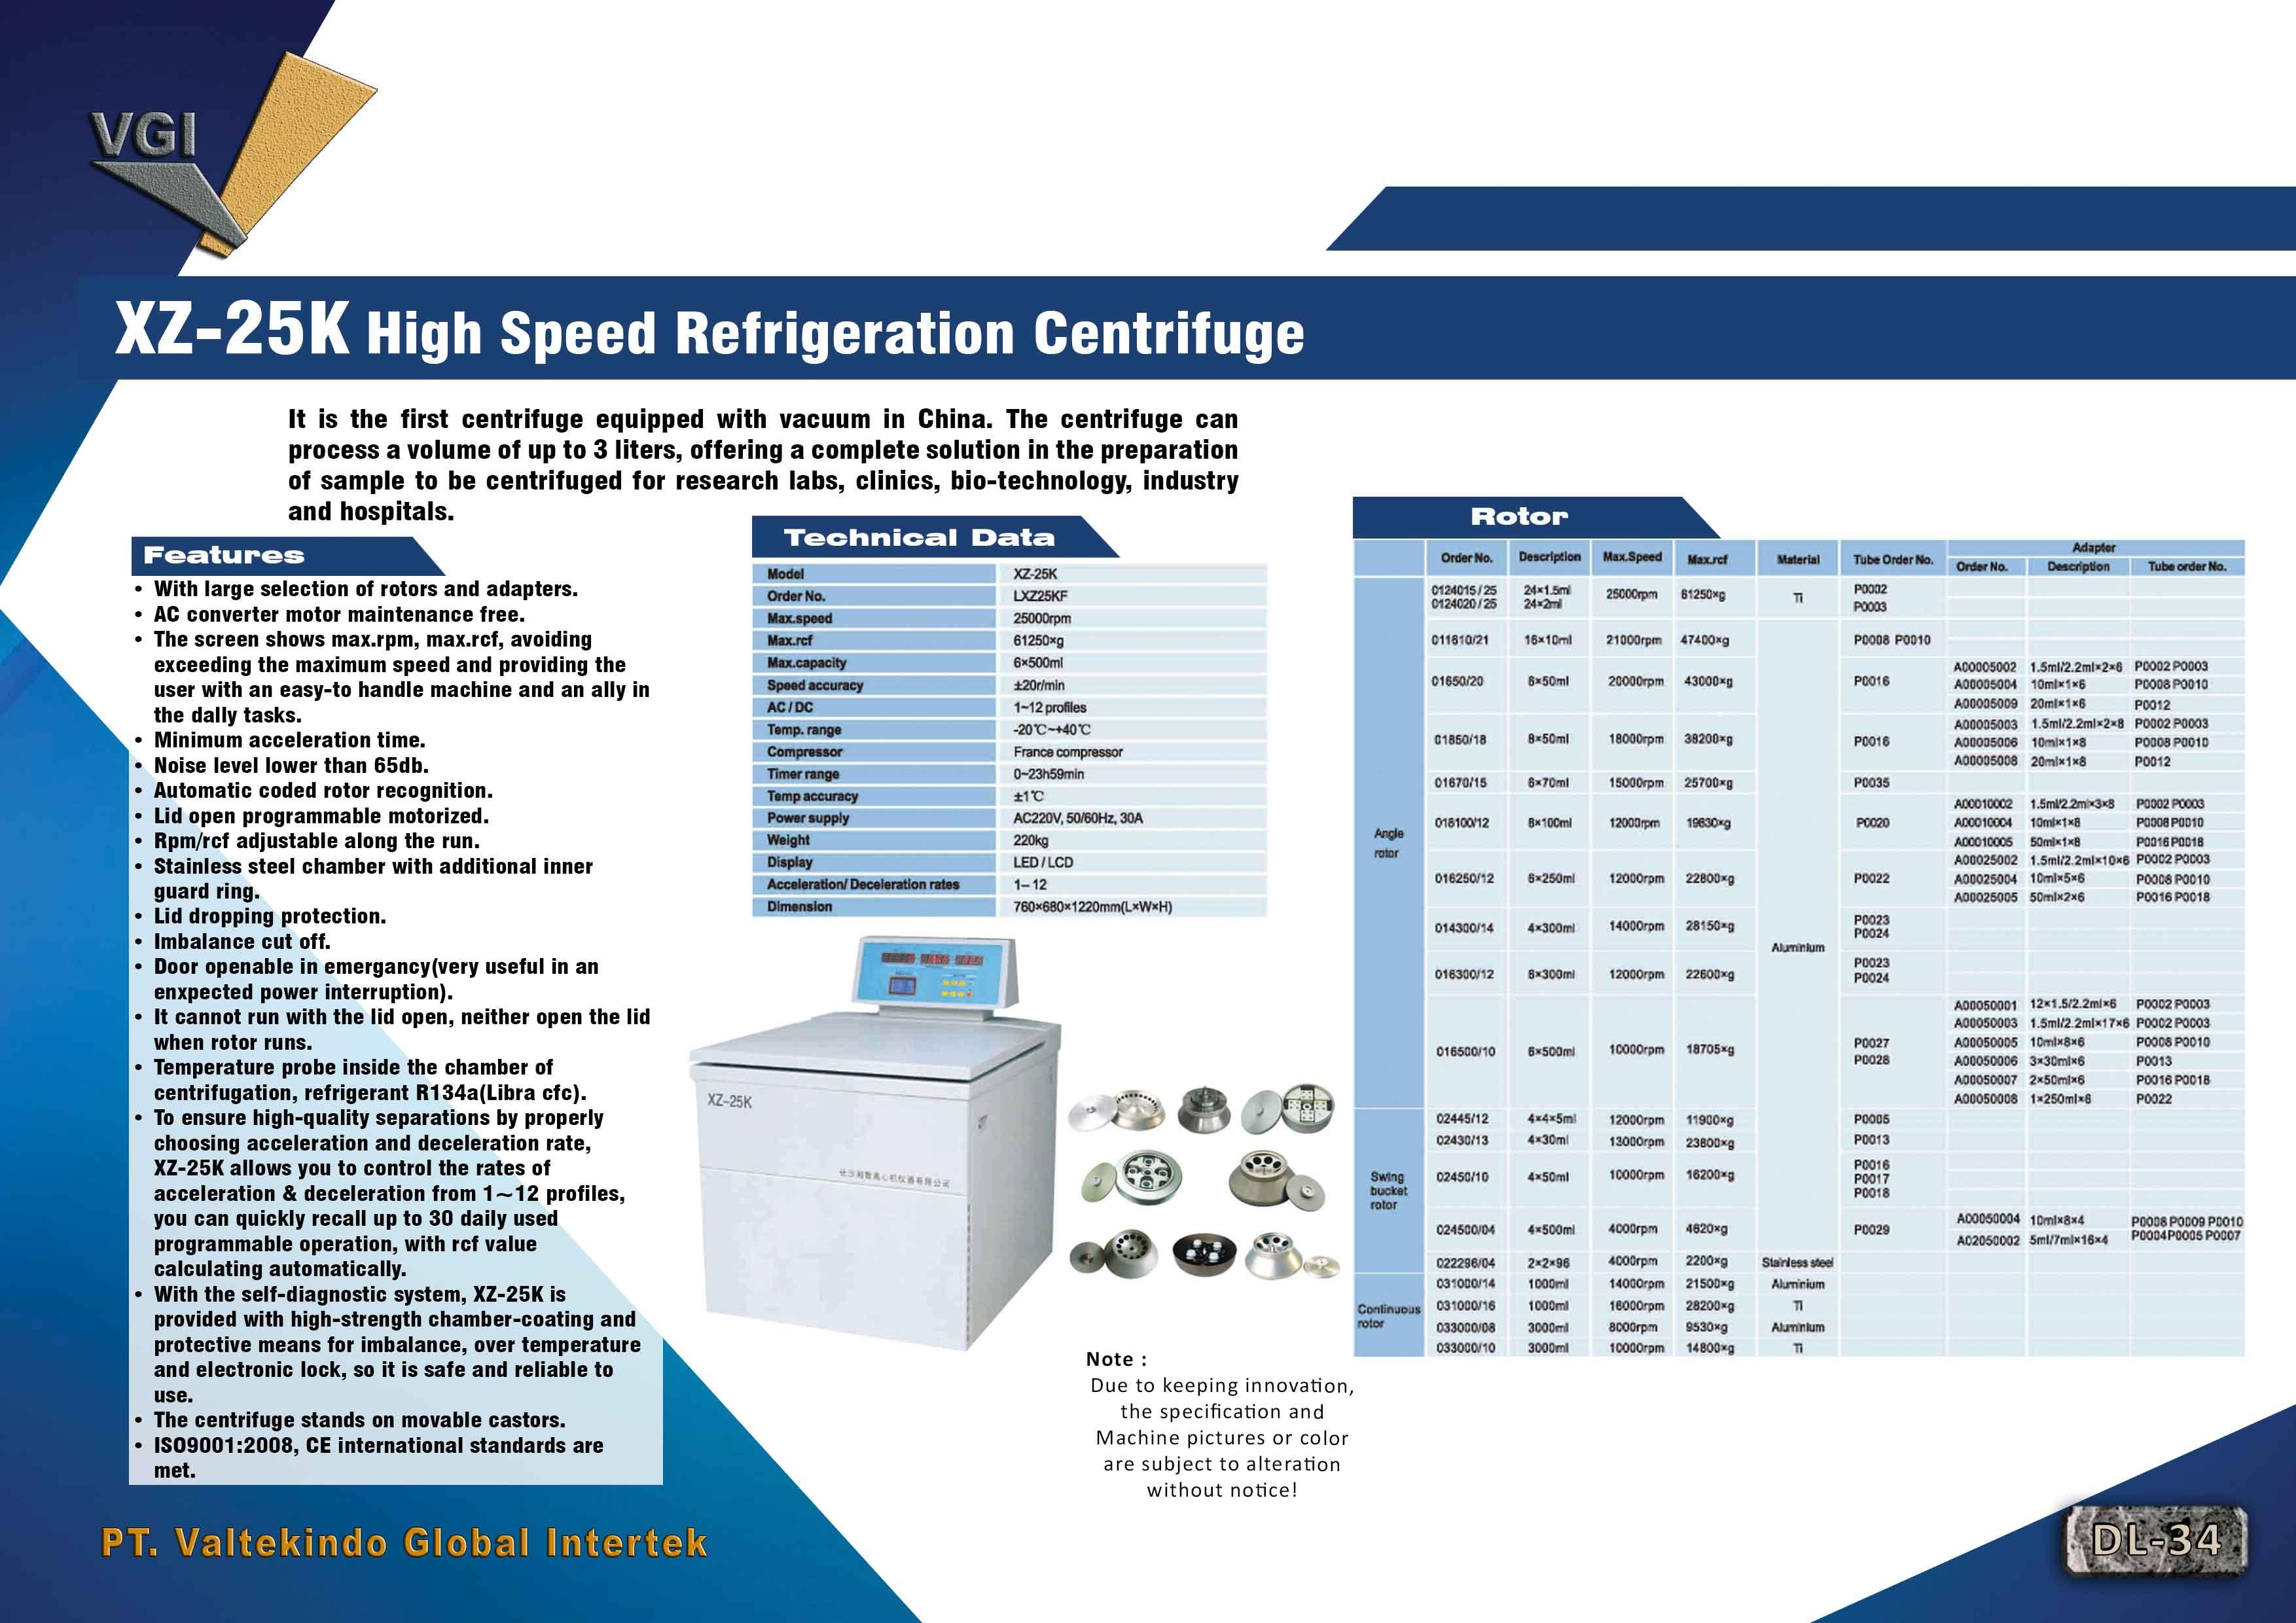 jual mesin, harga mesin, jual mesin bandung, distributor mesin, jual mesin karet, daur ulang karet, daur ulang plastik, mesin pertanian High Speed Refrigeration Centrifuge High Speed Refrigeration Centrifuge